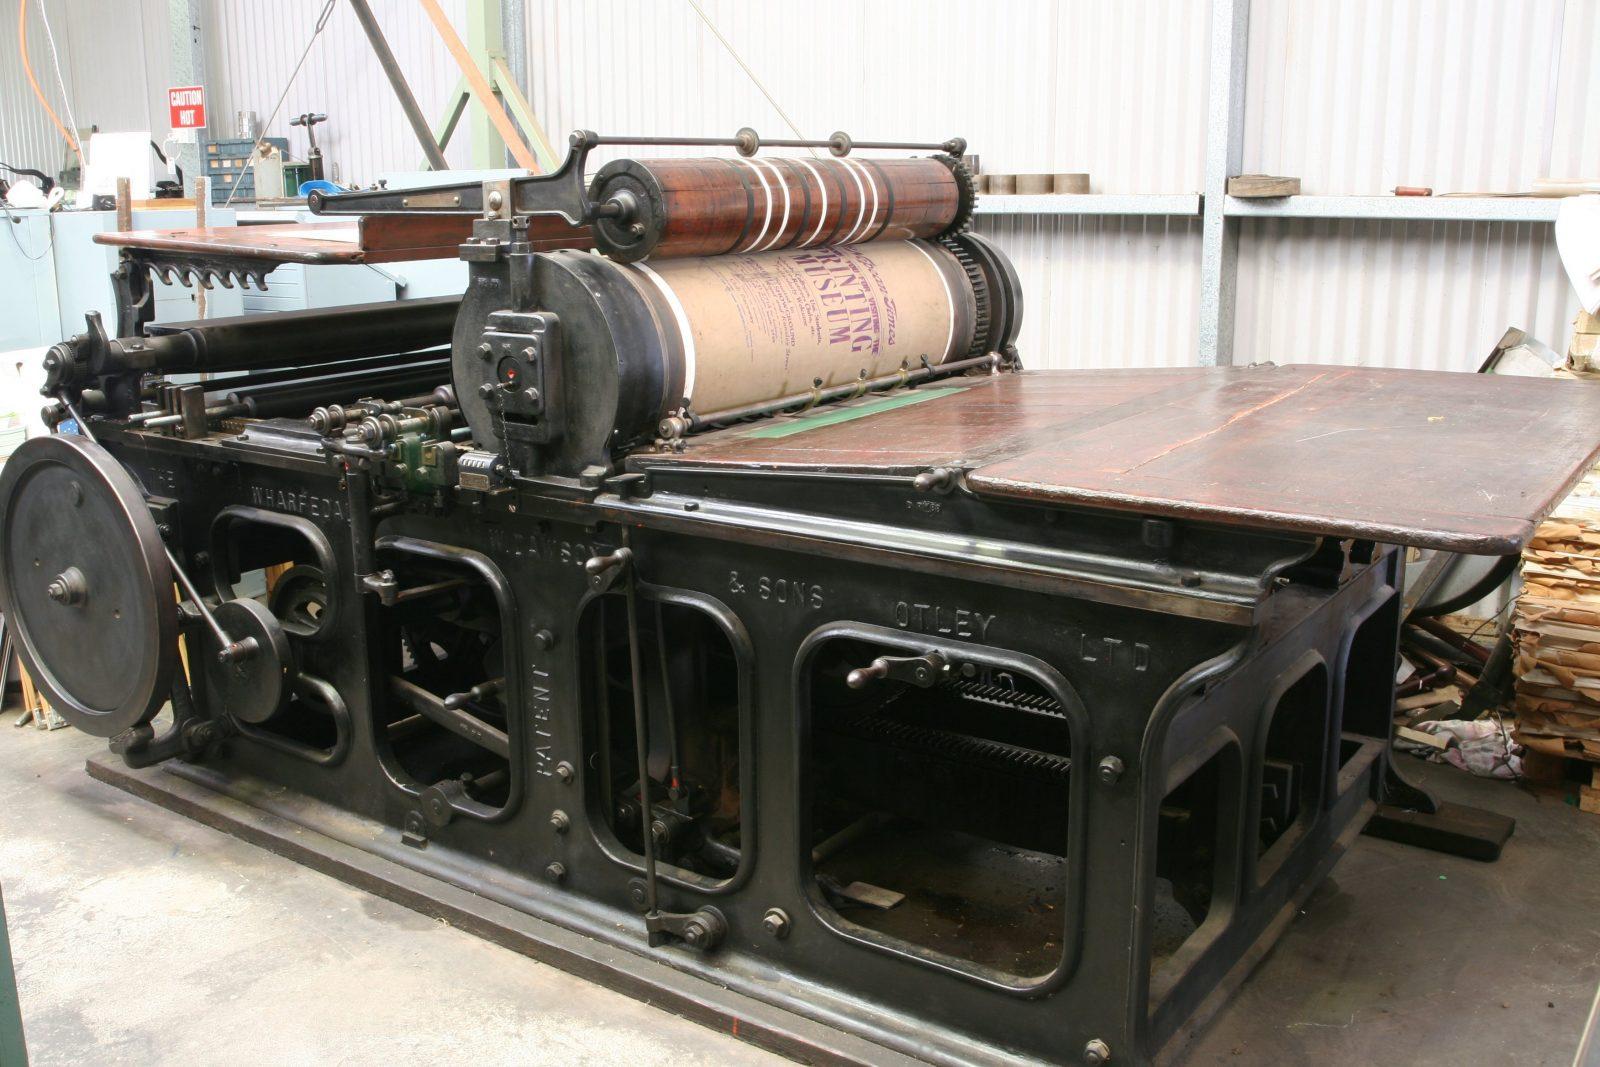 Large printing press